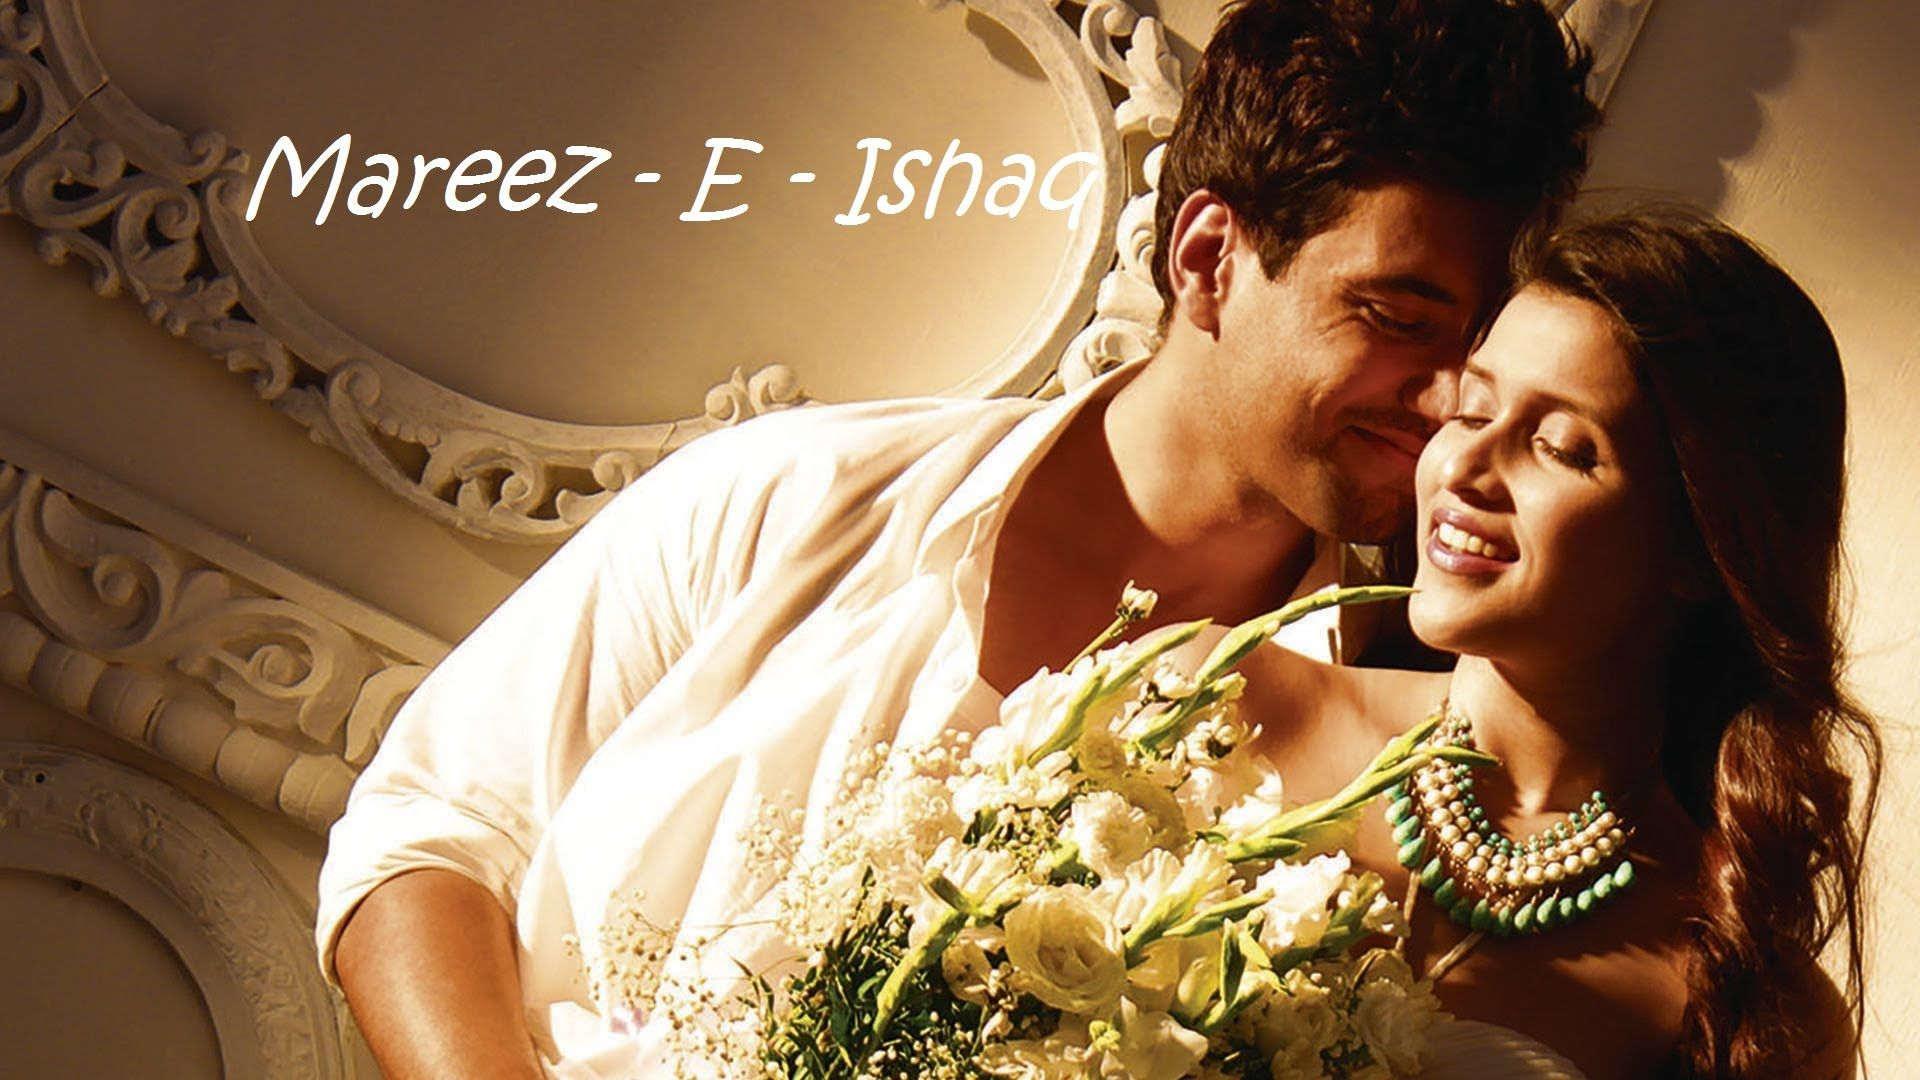 Mareez E Ishq Karde Dawaa Zid 2014 Bollywood Movie Latest Bollywood Songs Latest Celebrity Gossip